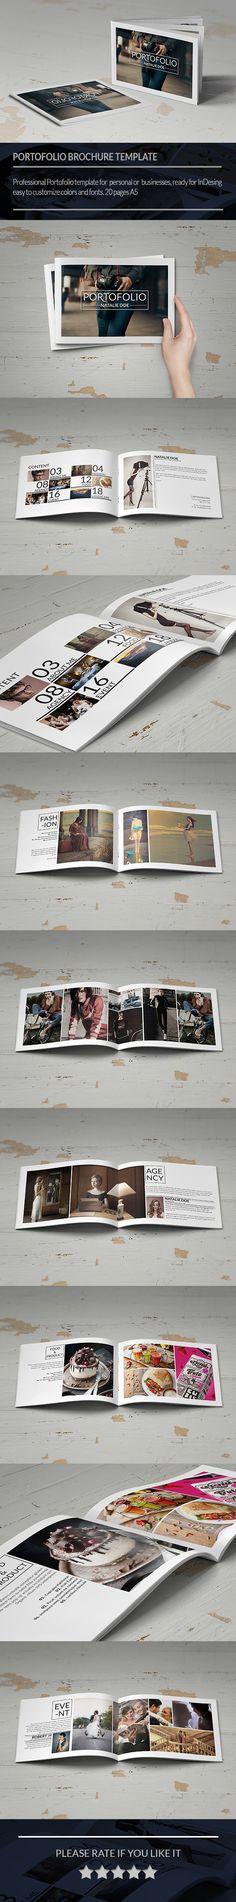 Photography Portofolio on Behance